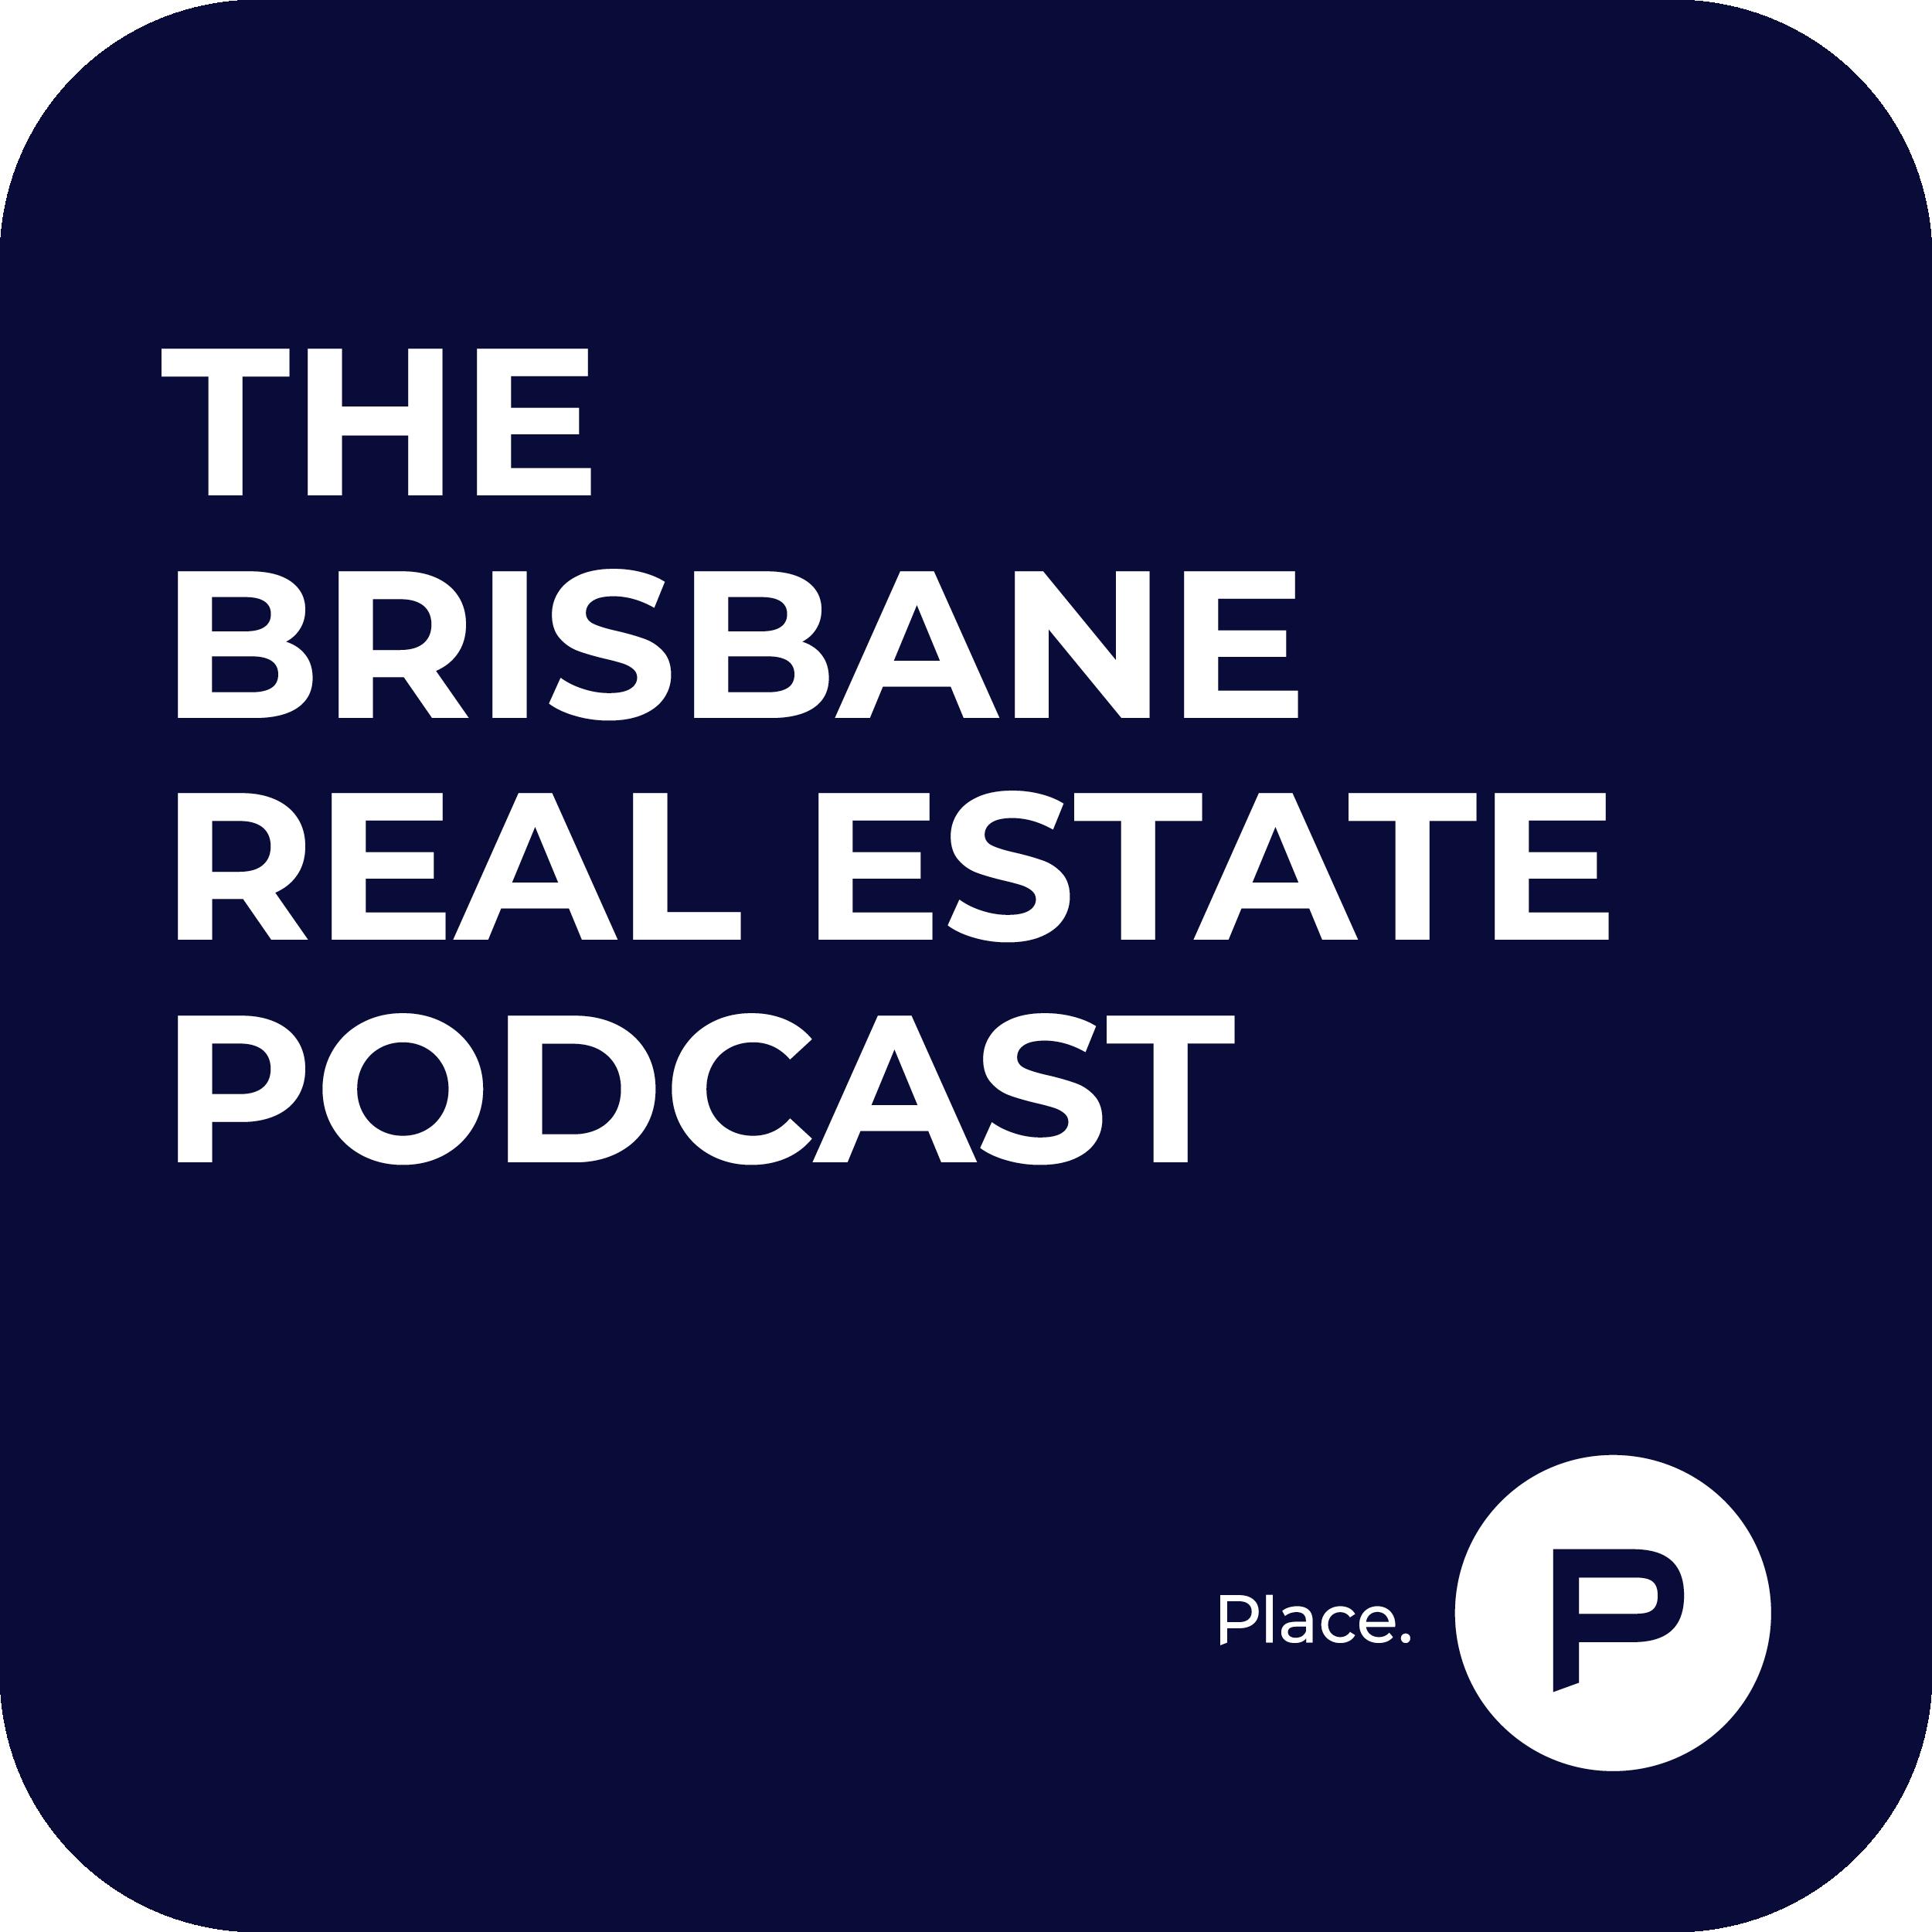 The Brisbane Real Estate Podcast